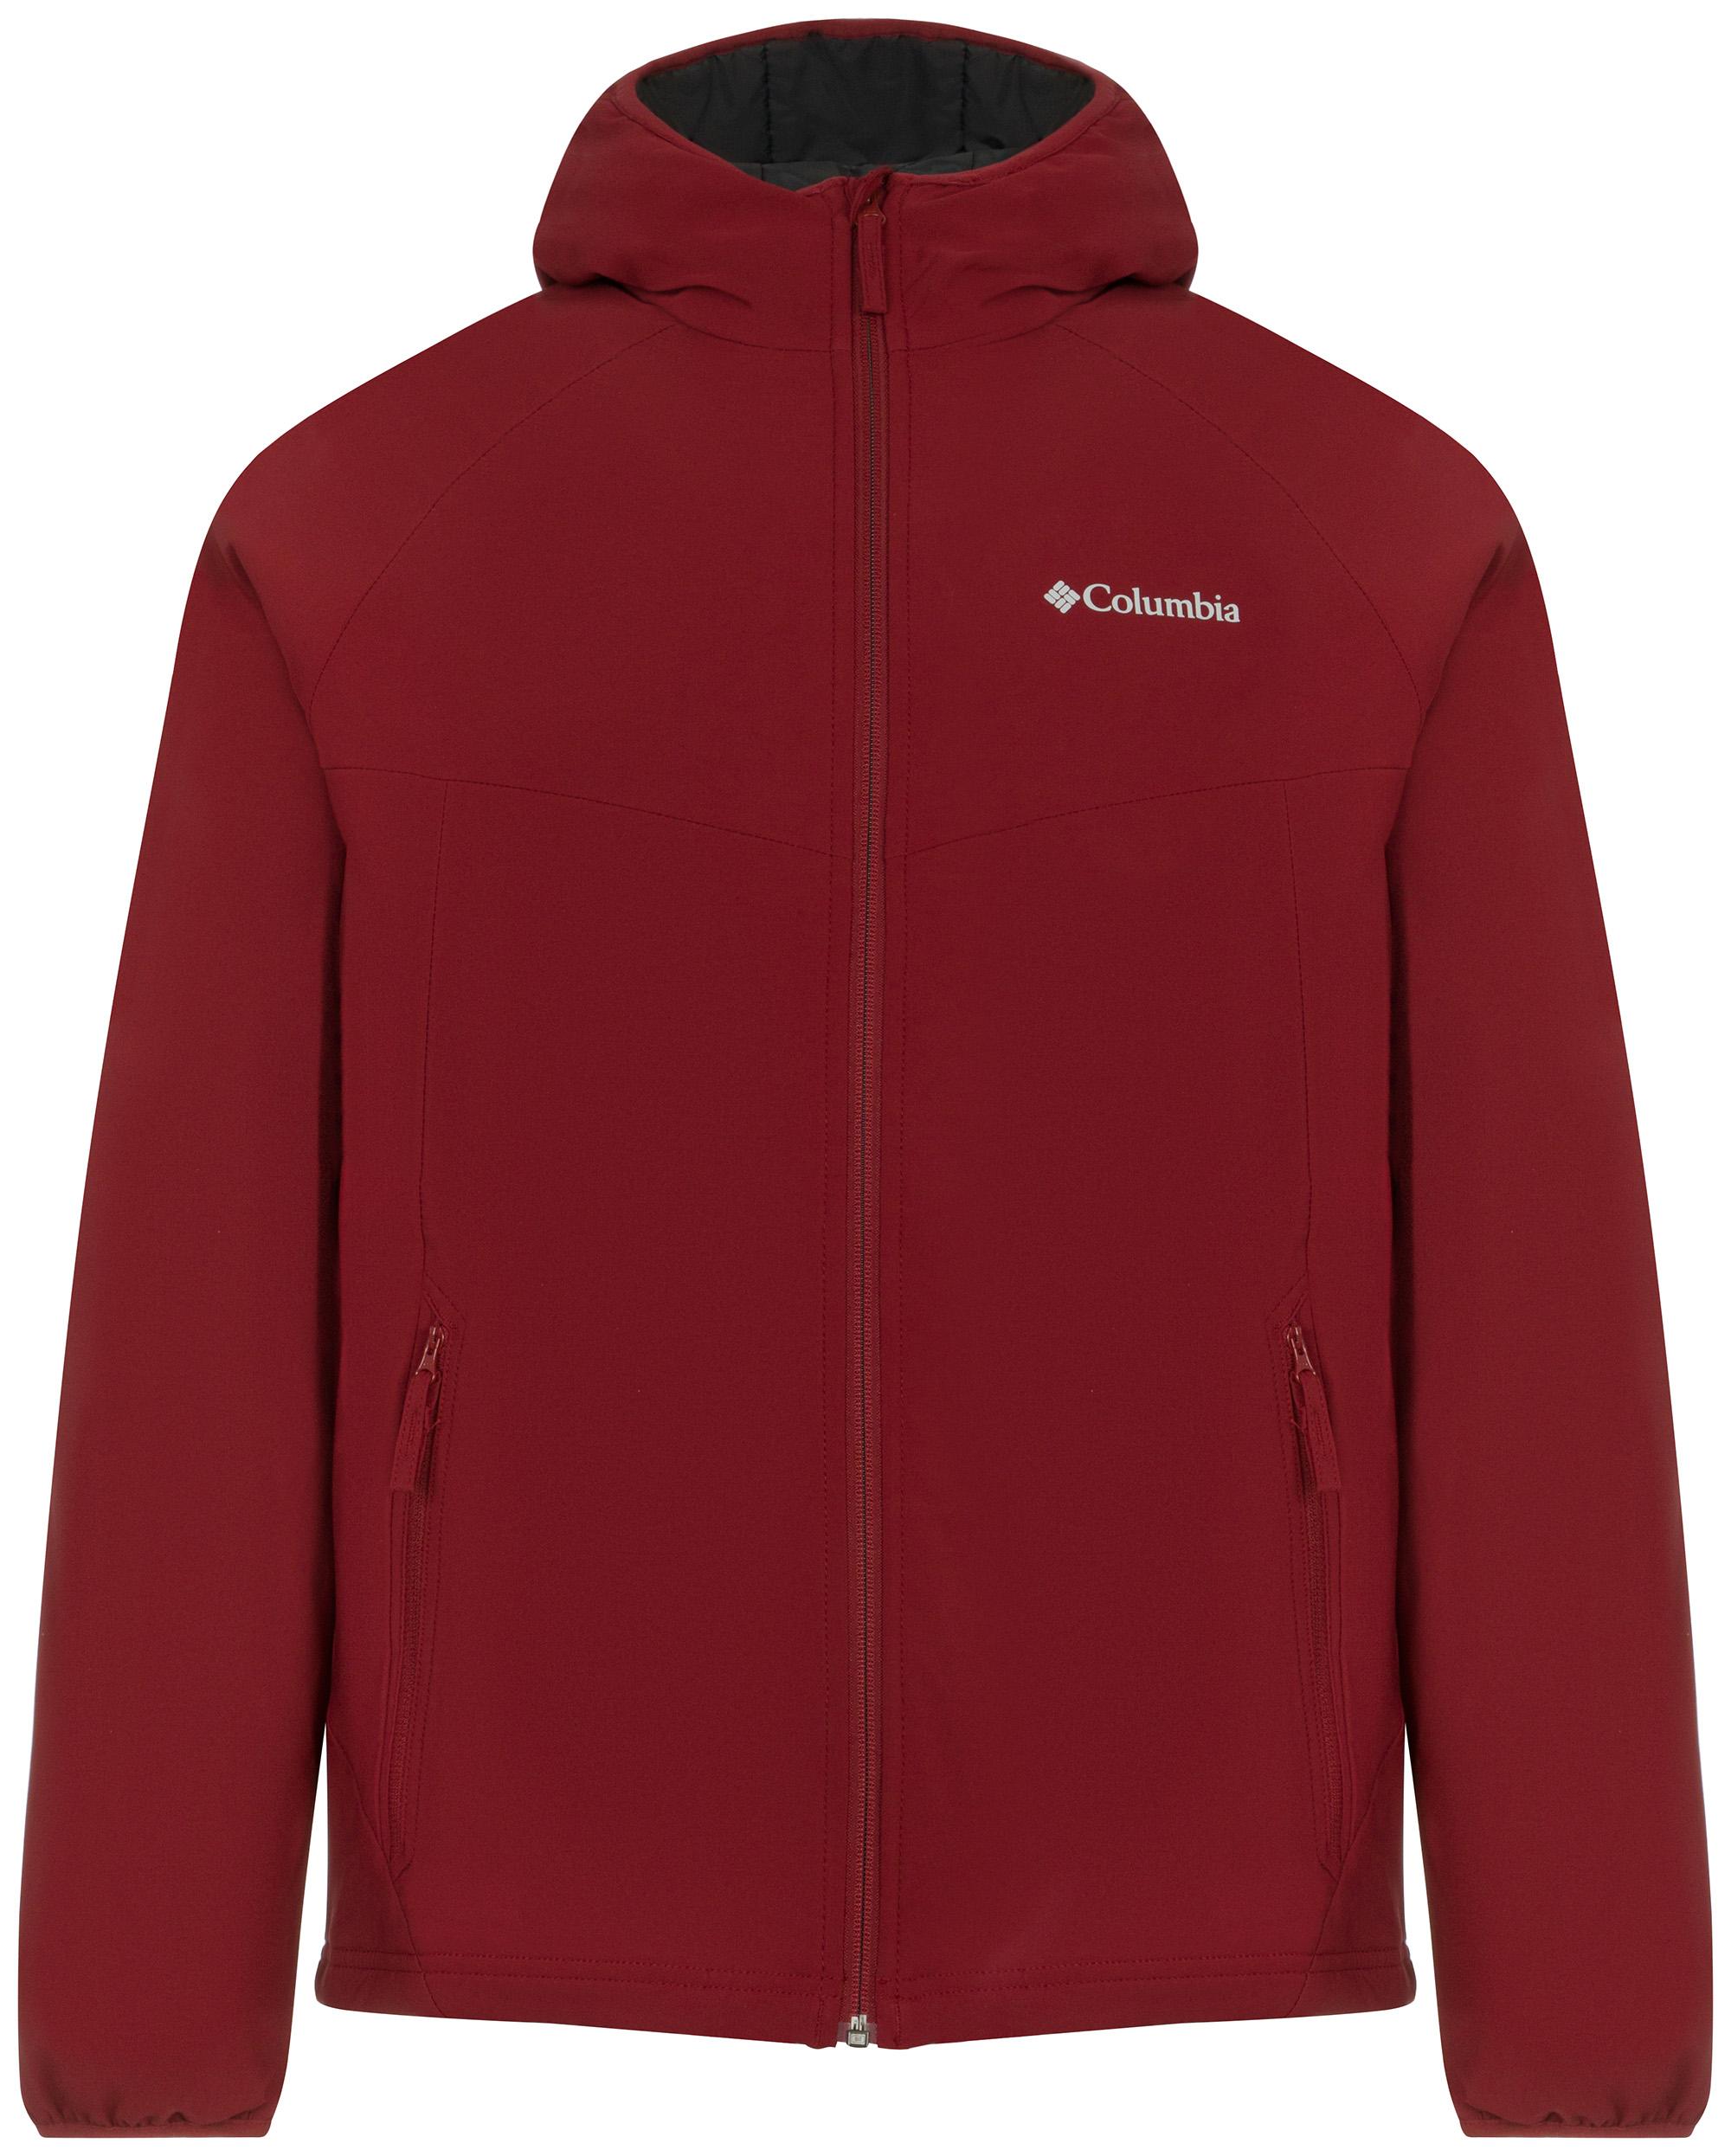 Columbia Куртка утепленная мужская Columbia Heather Canyon II, размер 46 columbia куртка утепленная мужская columbia eagles call